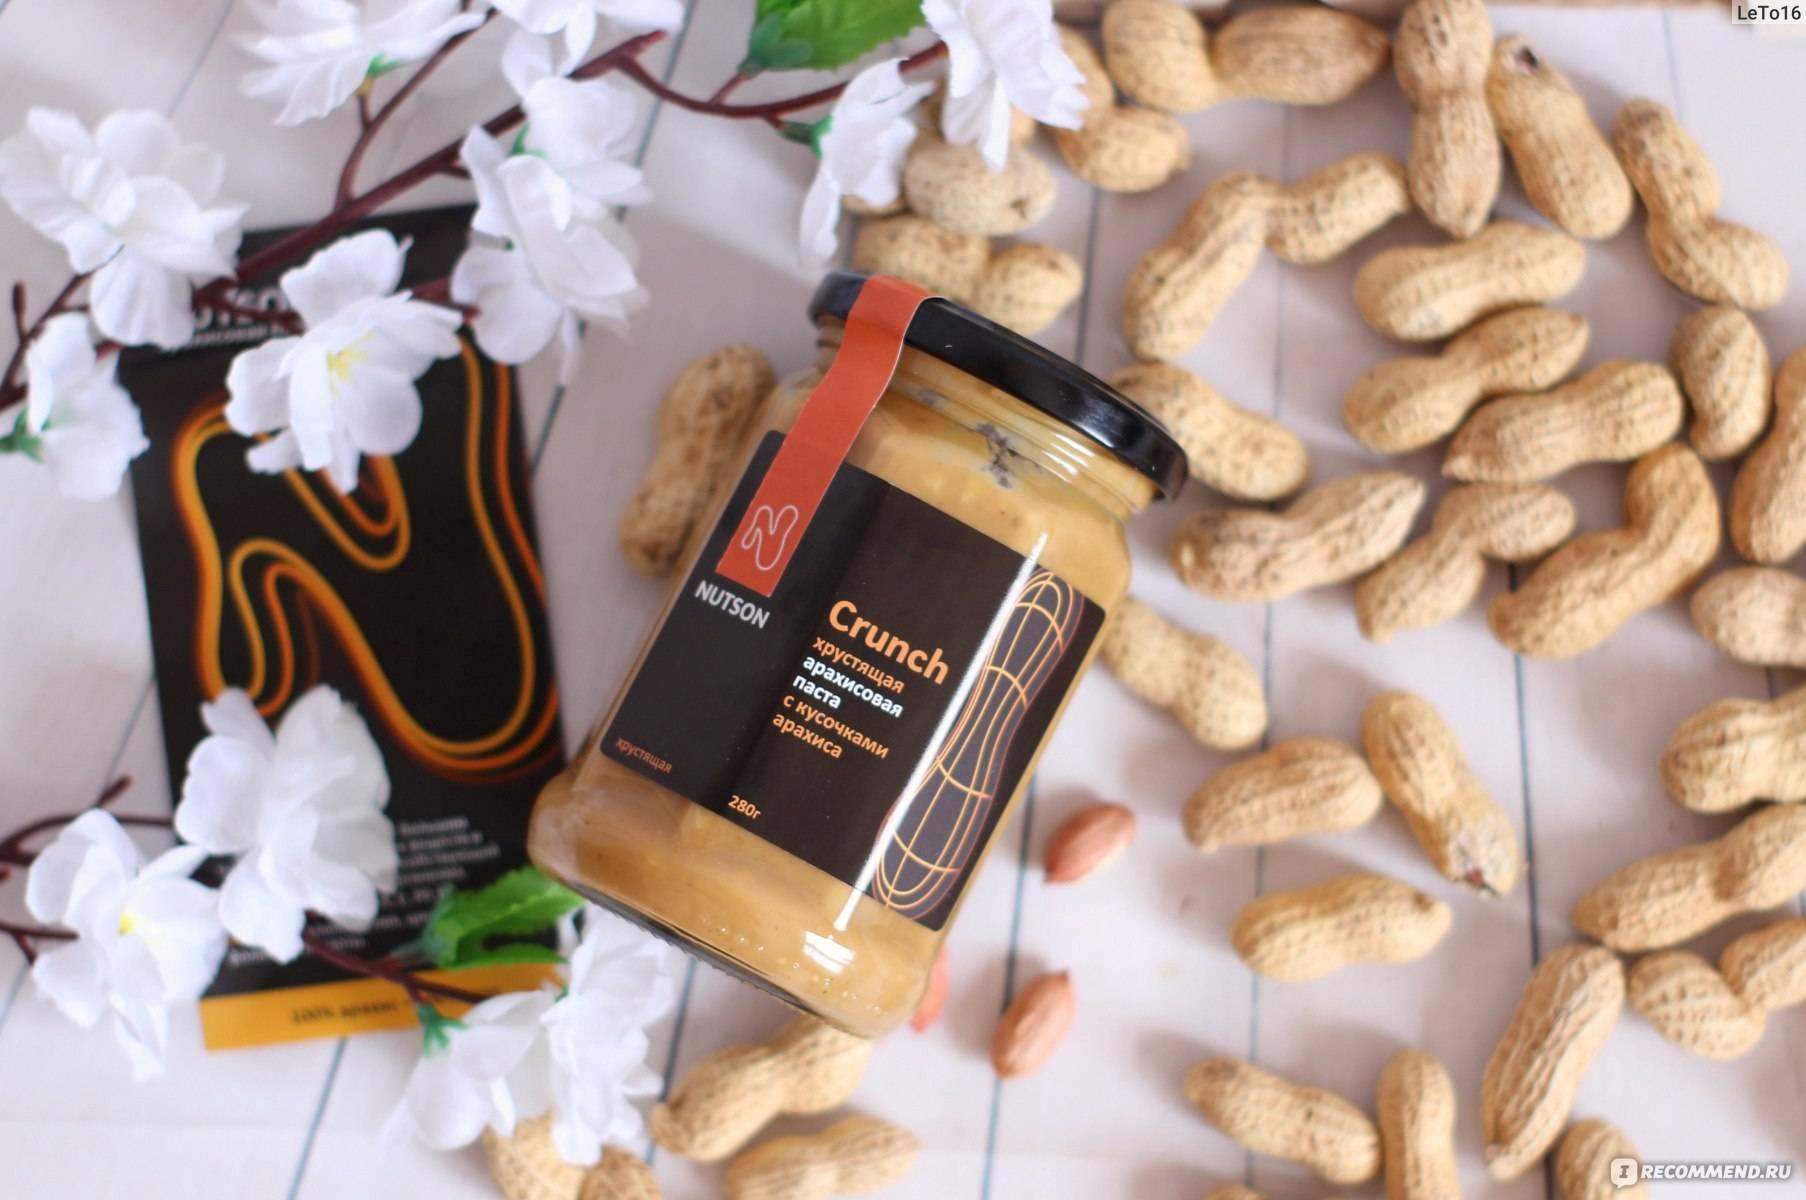 Орехи, семечки и сухофрукты при панкреатите | компетентно о здоровье на ilive